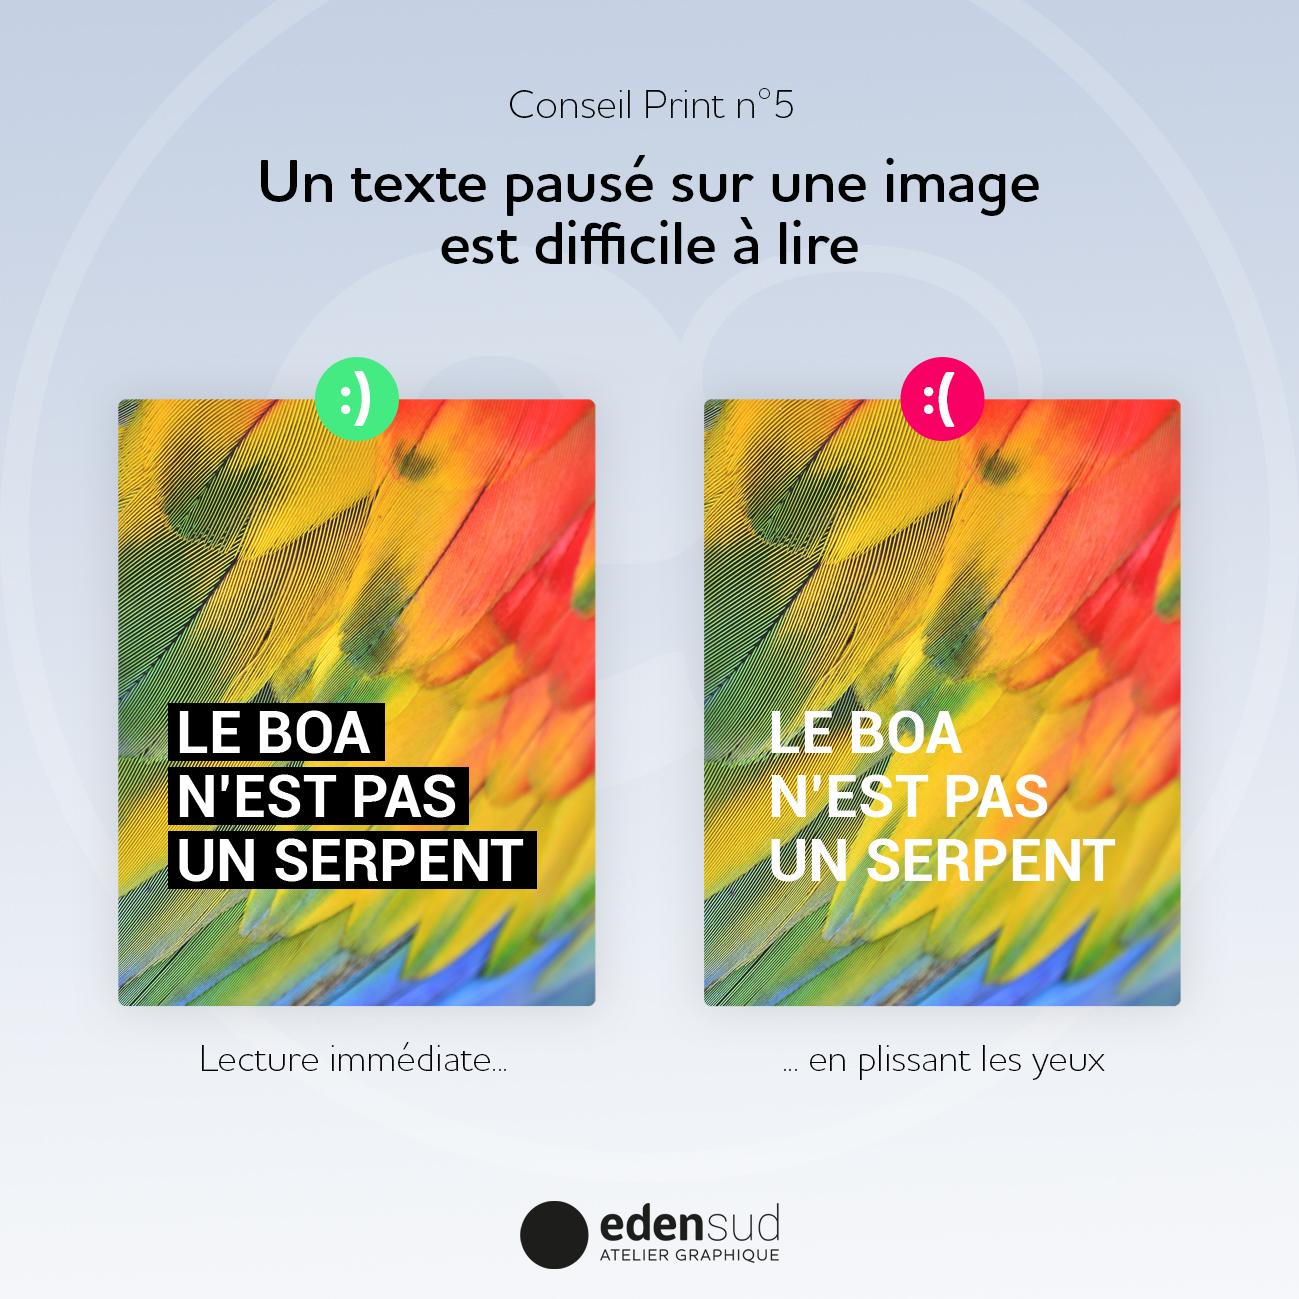 Edensud_Print_05